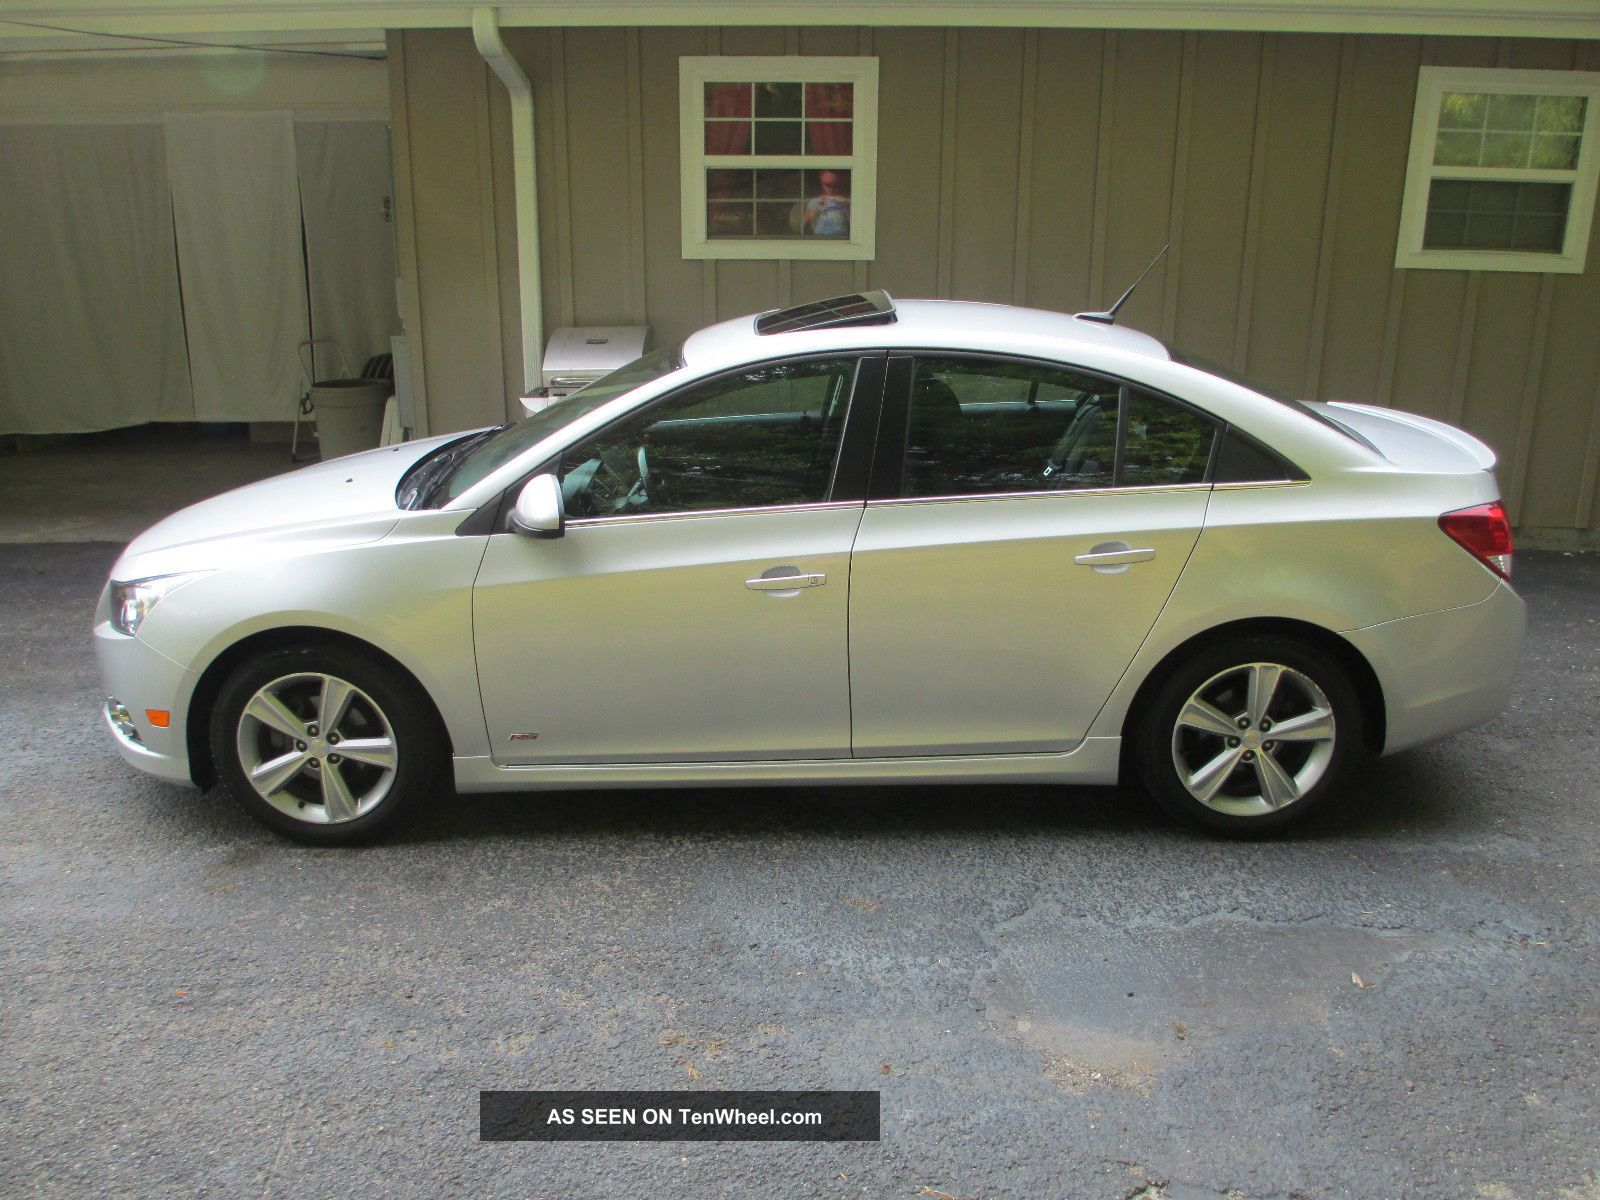 2012 Chevrolet Cruze 2lt Ltz Rs